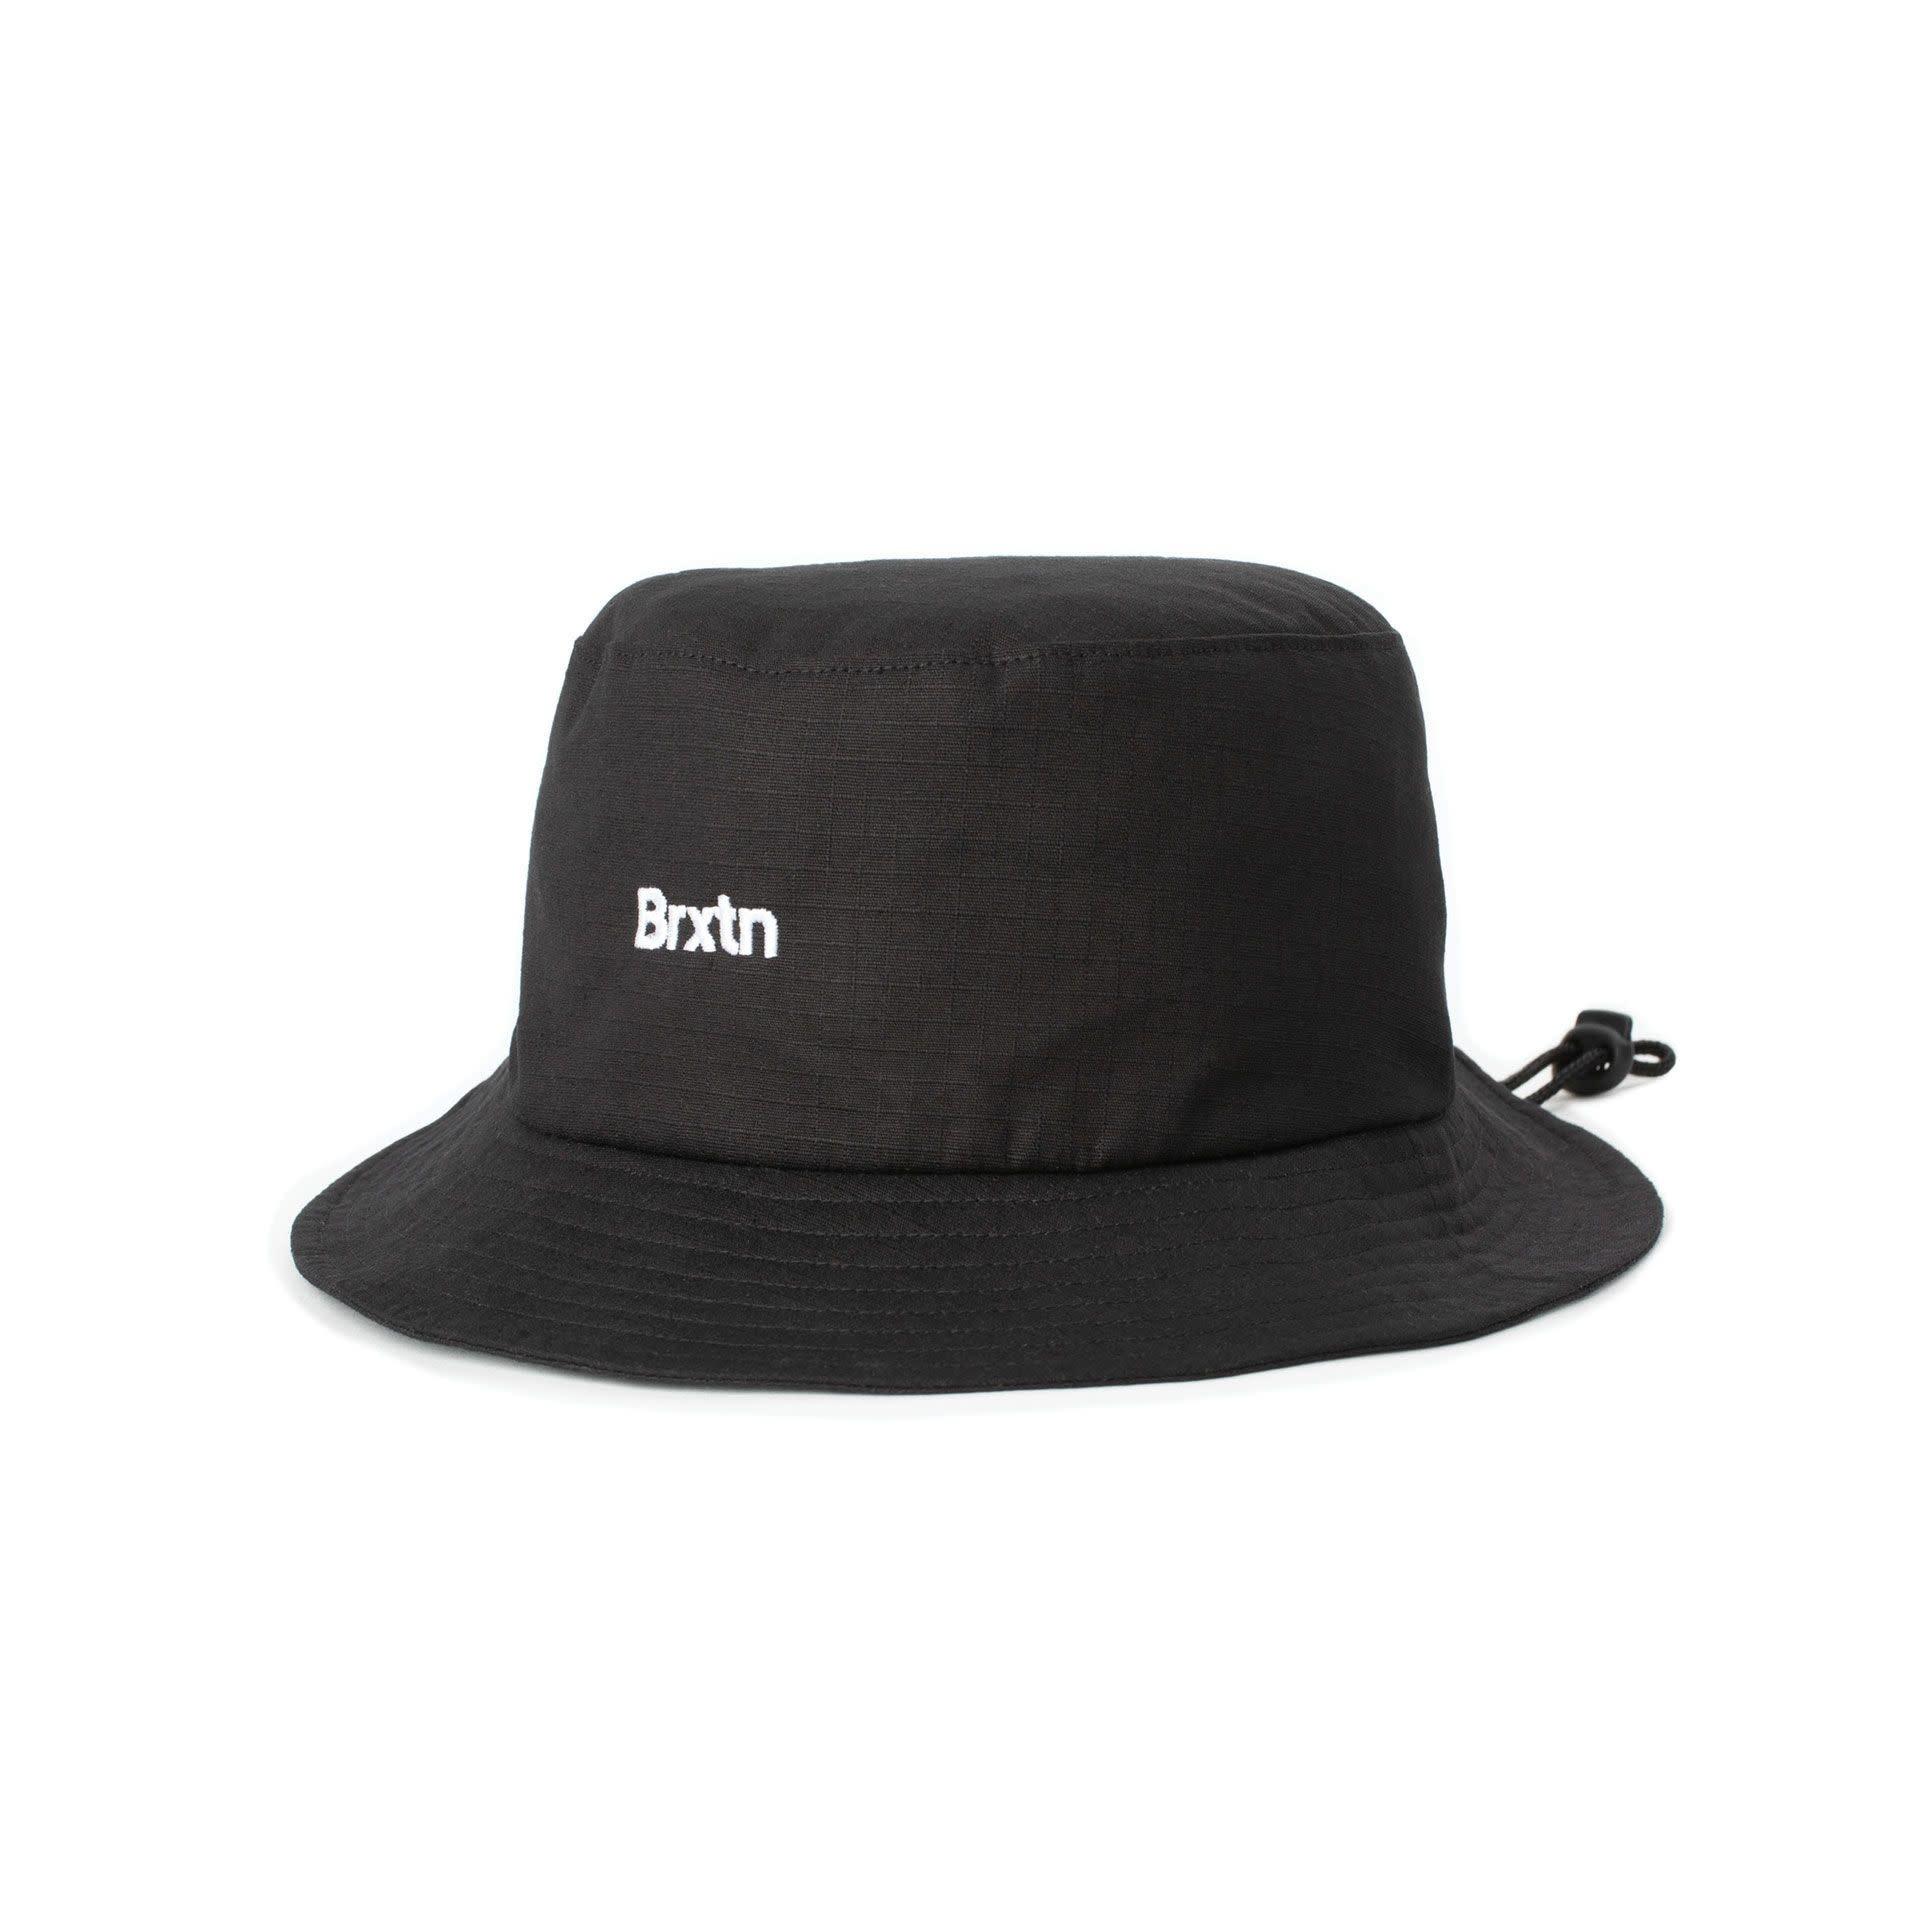 Brixton Brixton Gate Bucket Hat Black